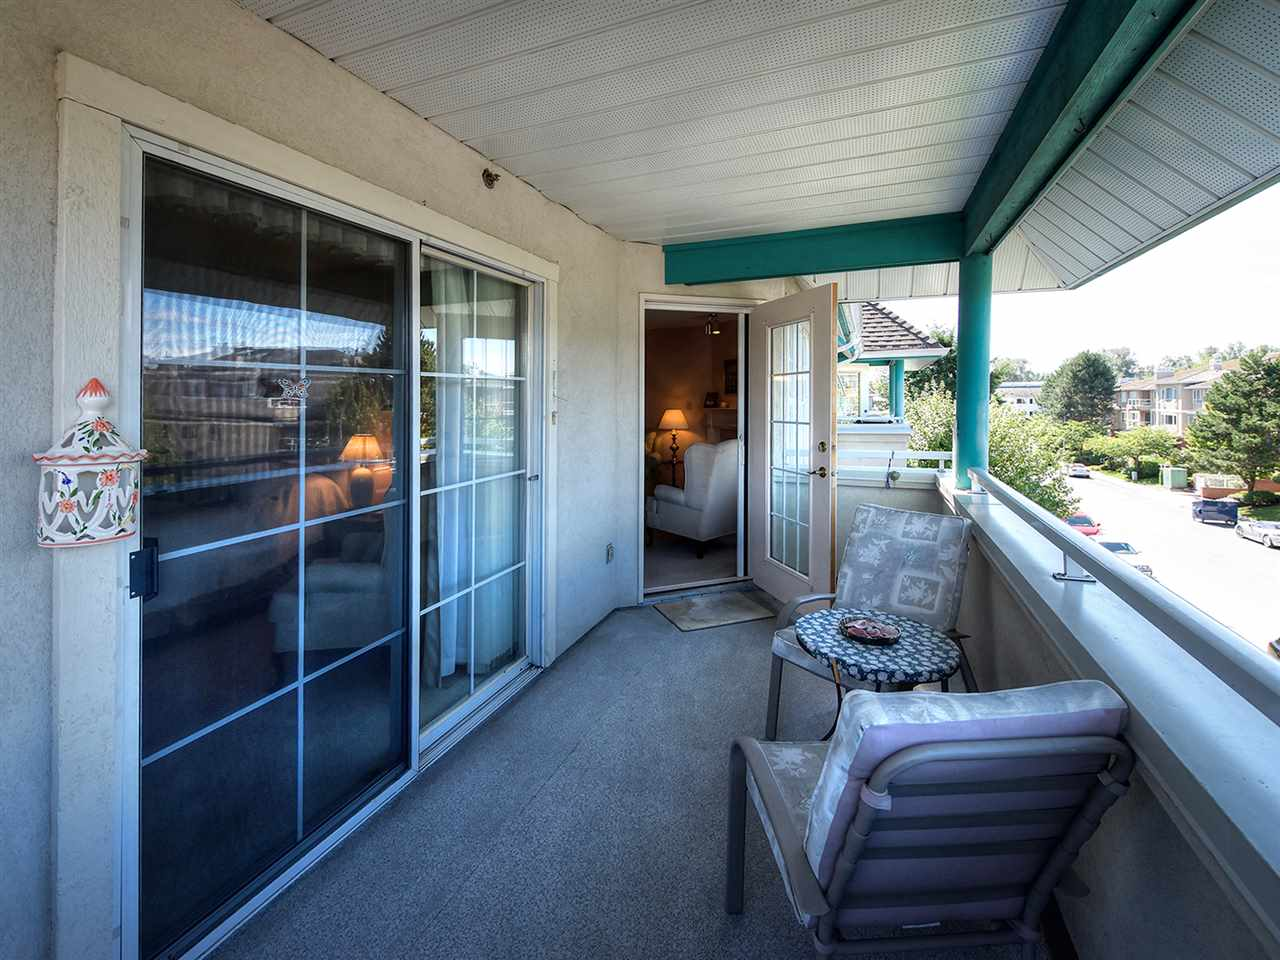 Condo Apartment at 301 1172 55 STREET, Unit 301, Tsawwassen, British Columbia. Image 6